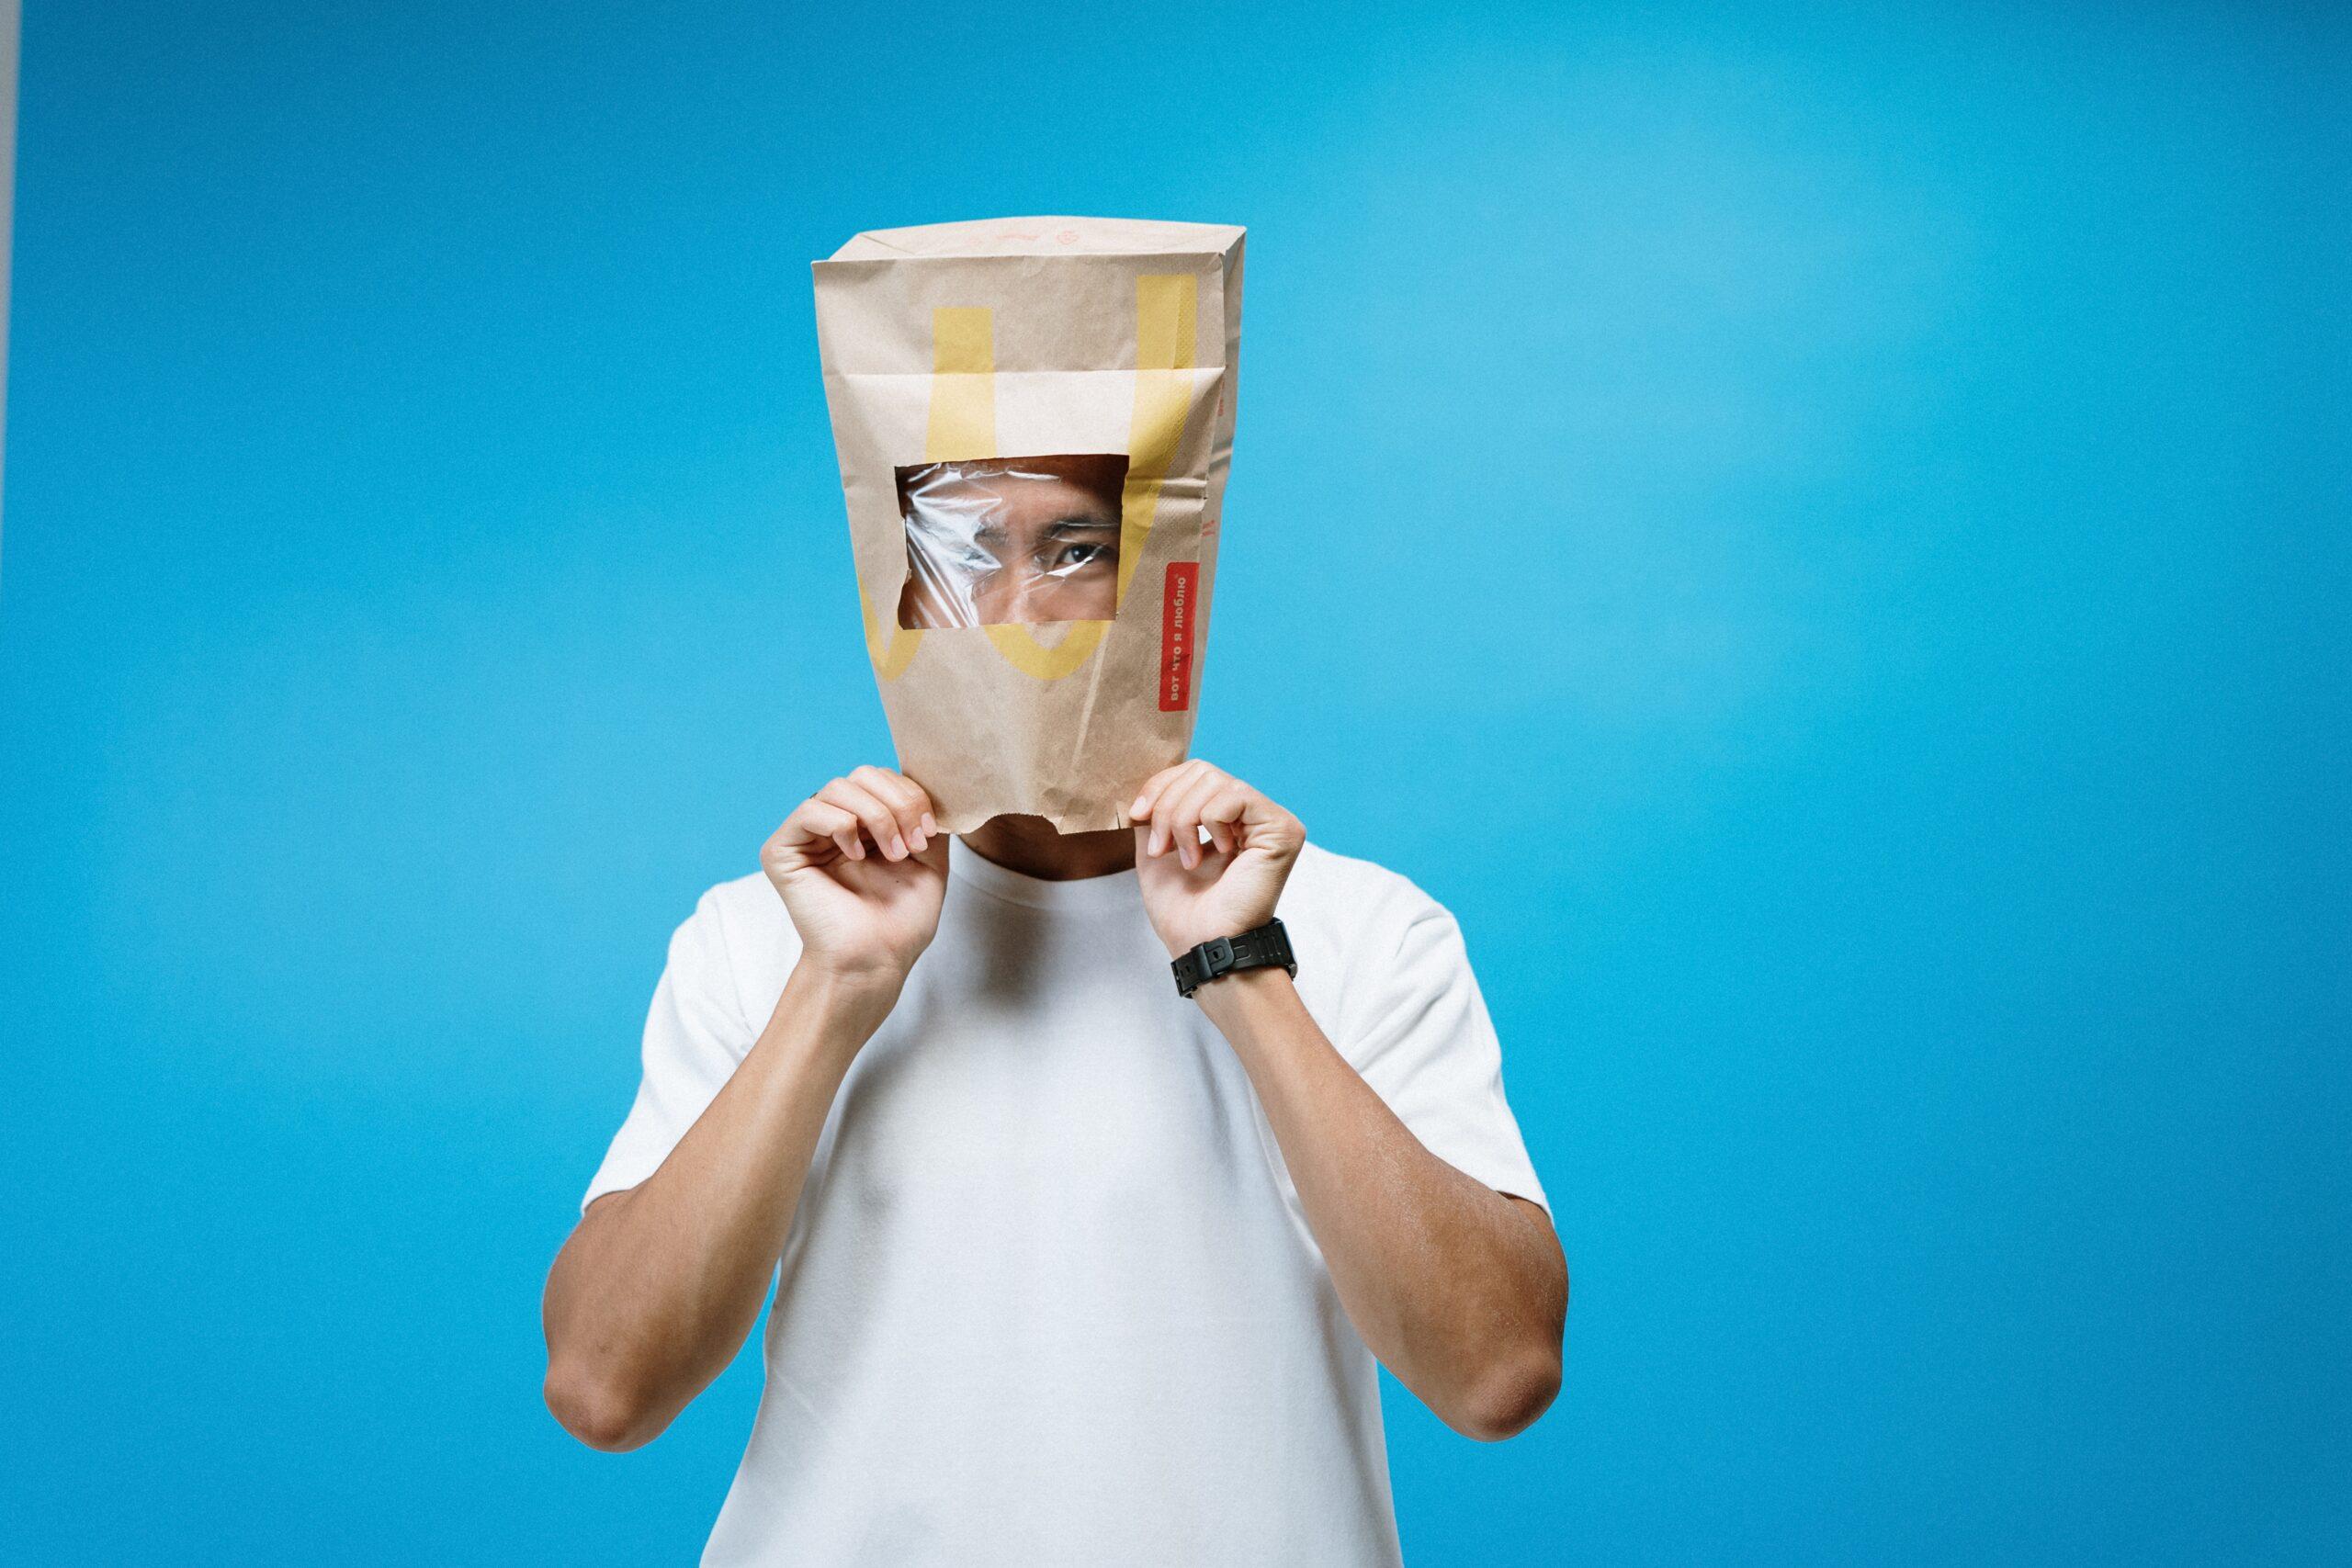 Man wearing paper bag on his head